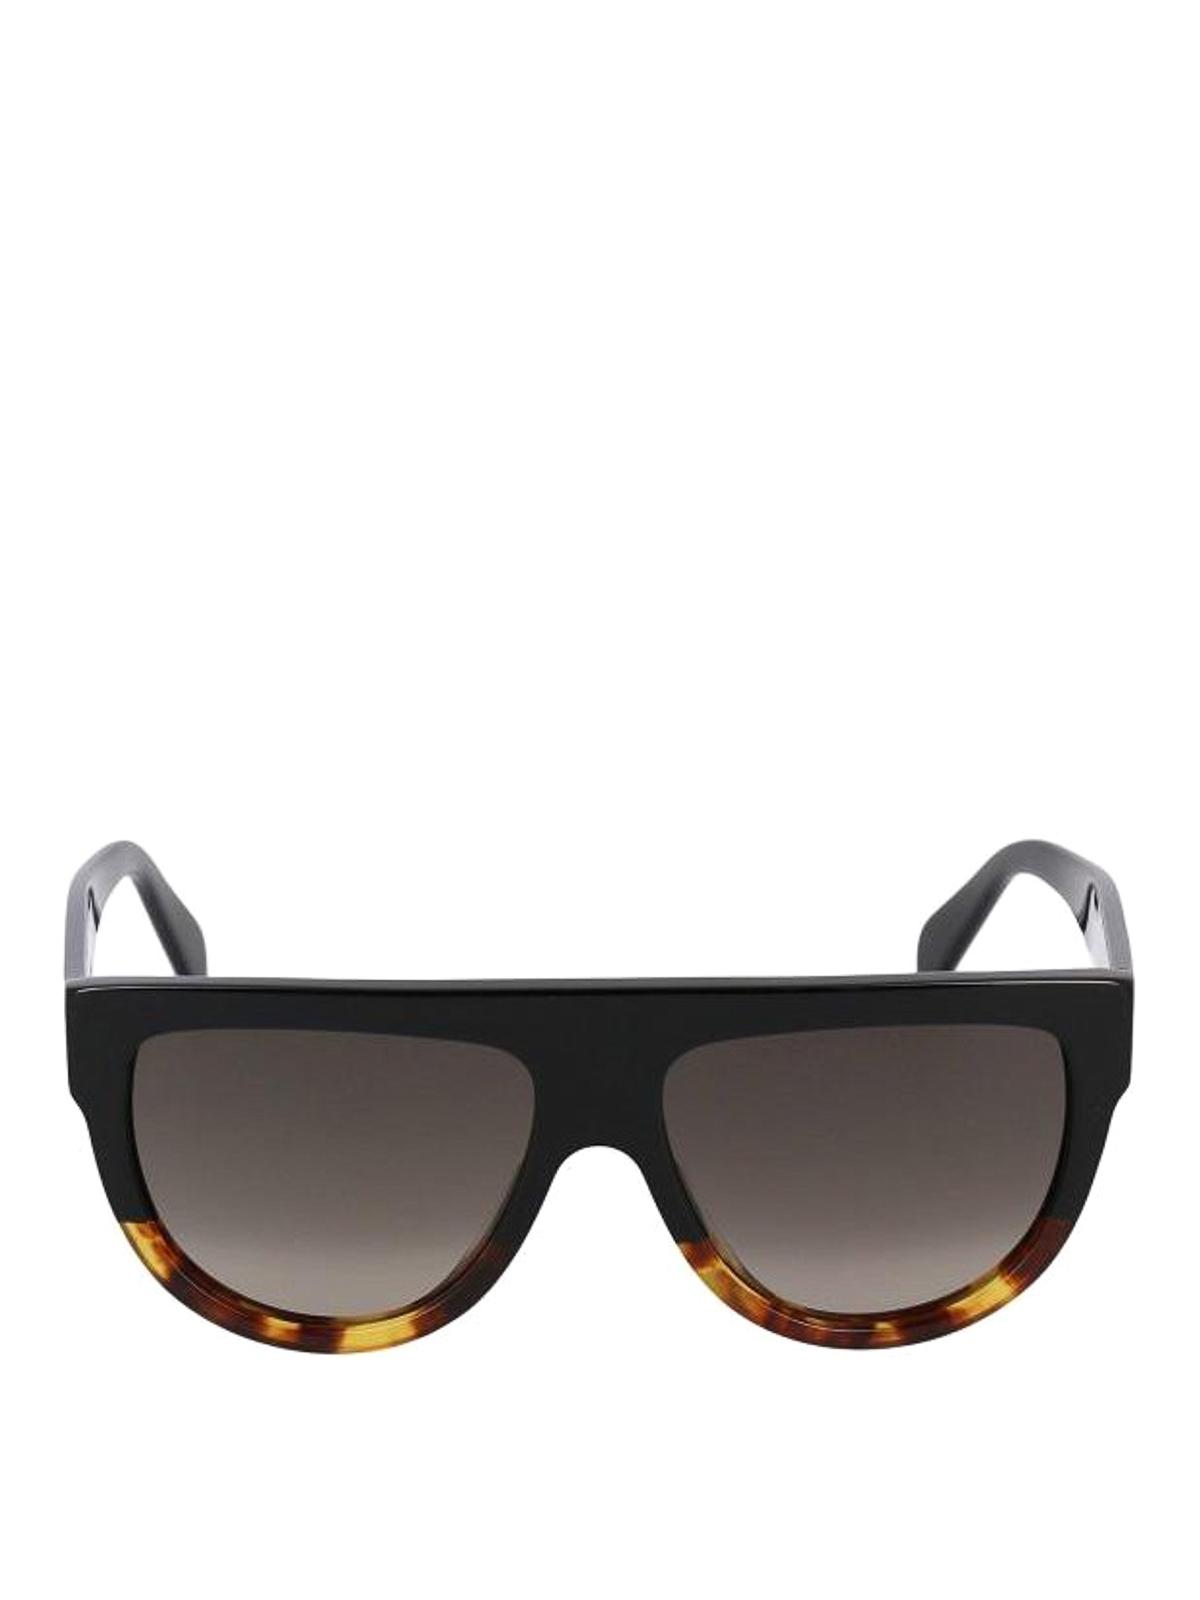 f976304569 Celine Black Acetate Aviator Sunglasses